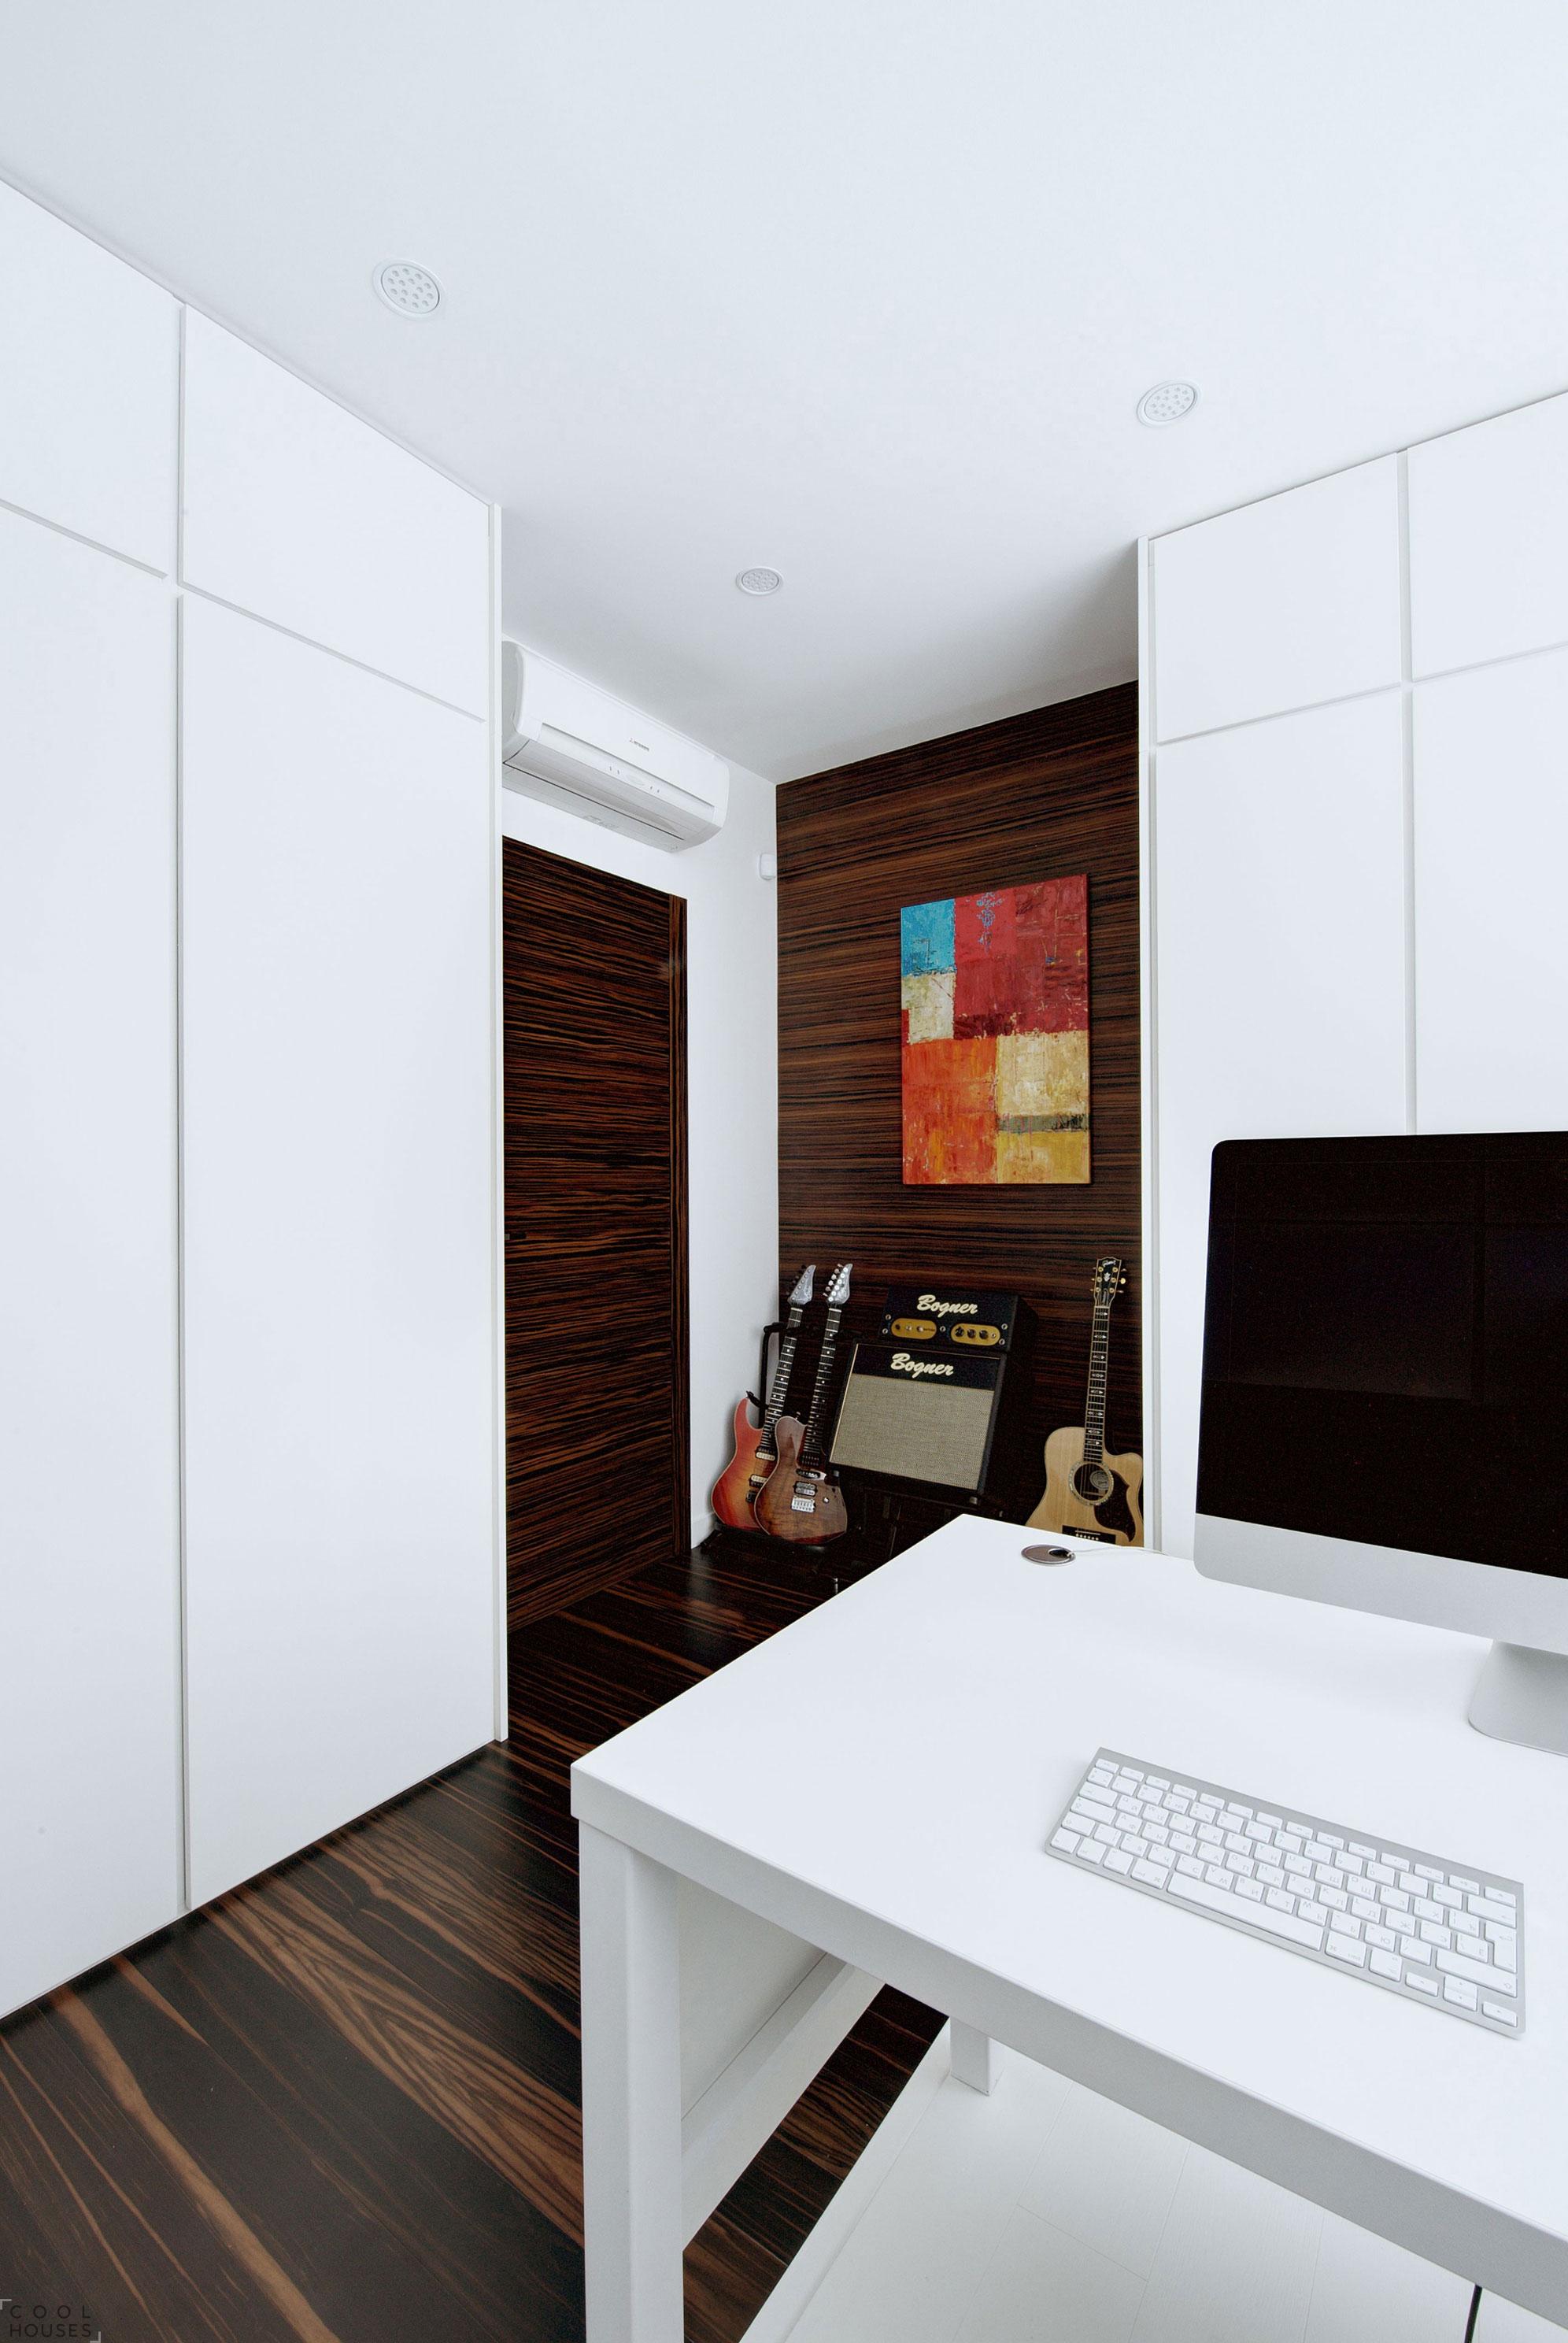 Современная квартира в Москве в стиле минимализма